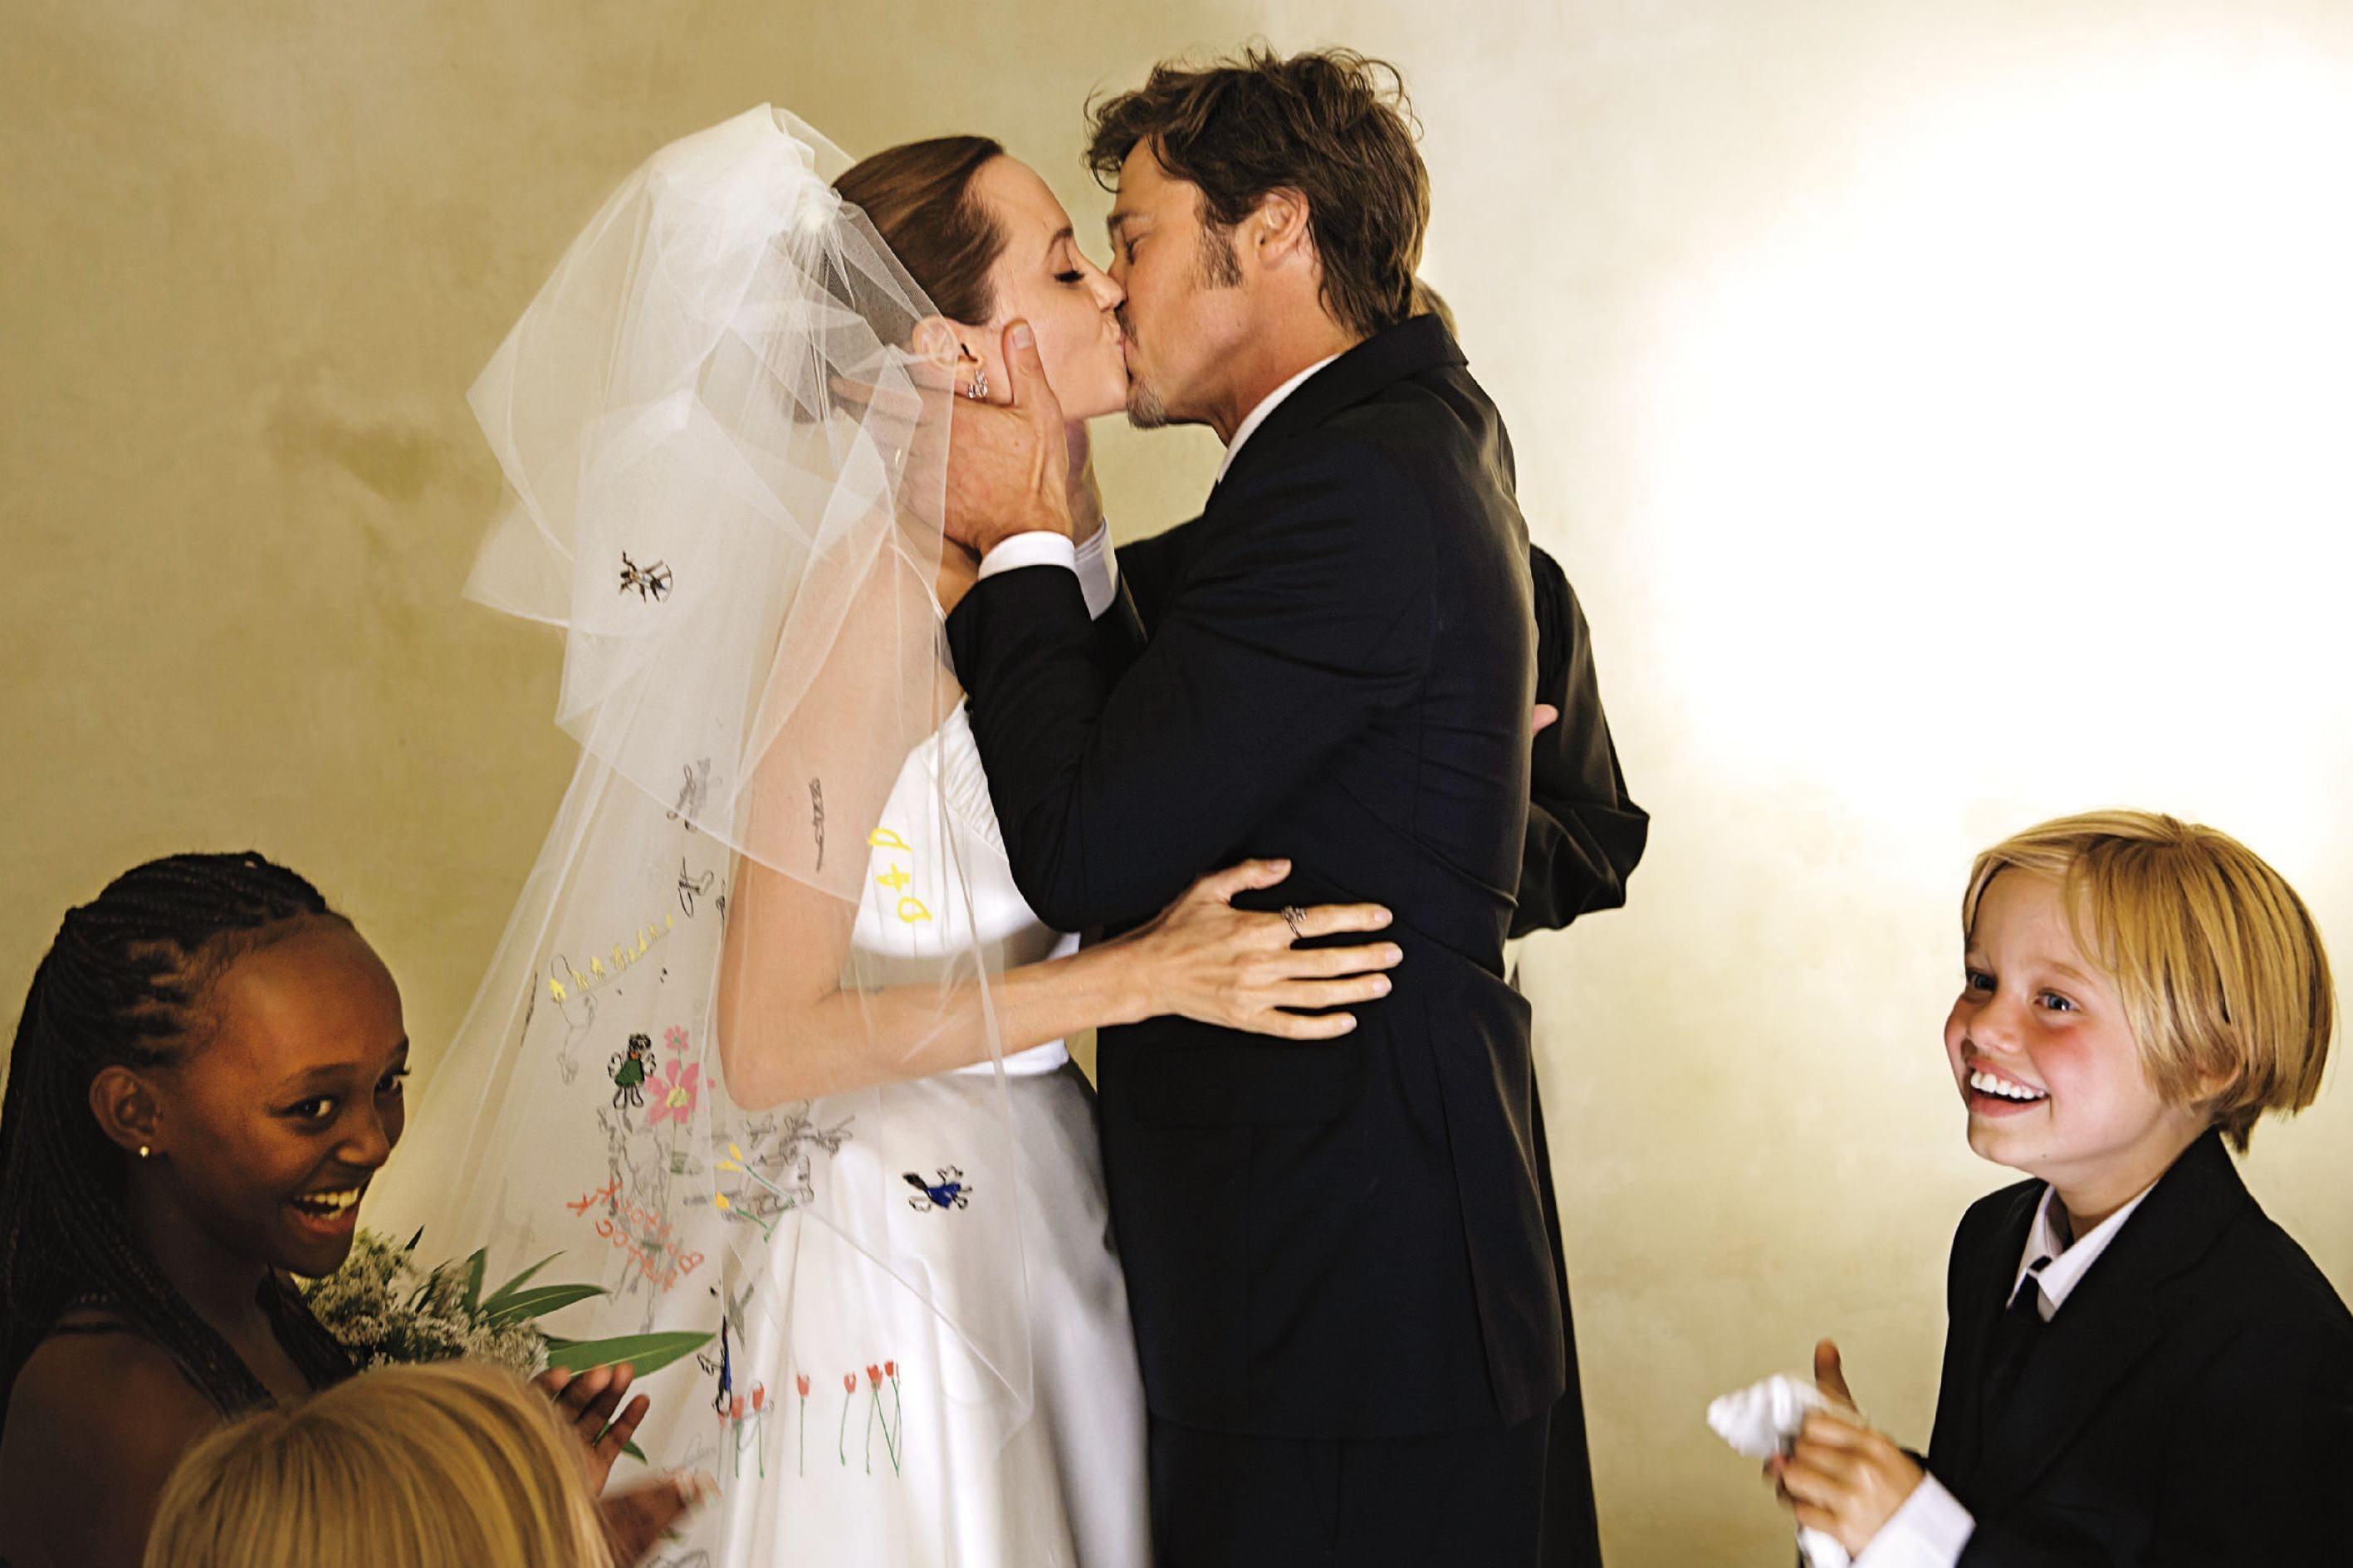 Brad & Angelina Wedding Photos